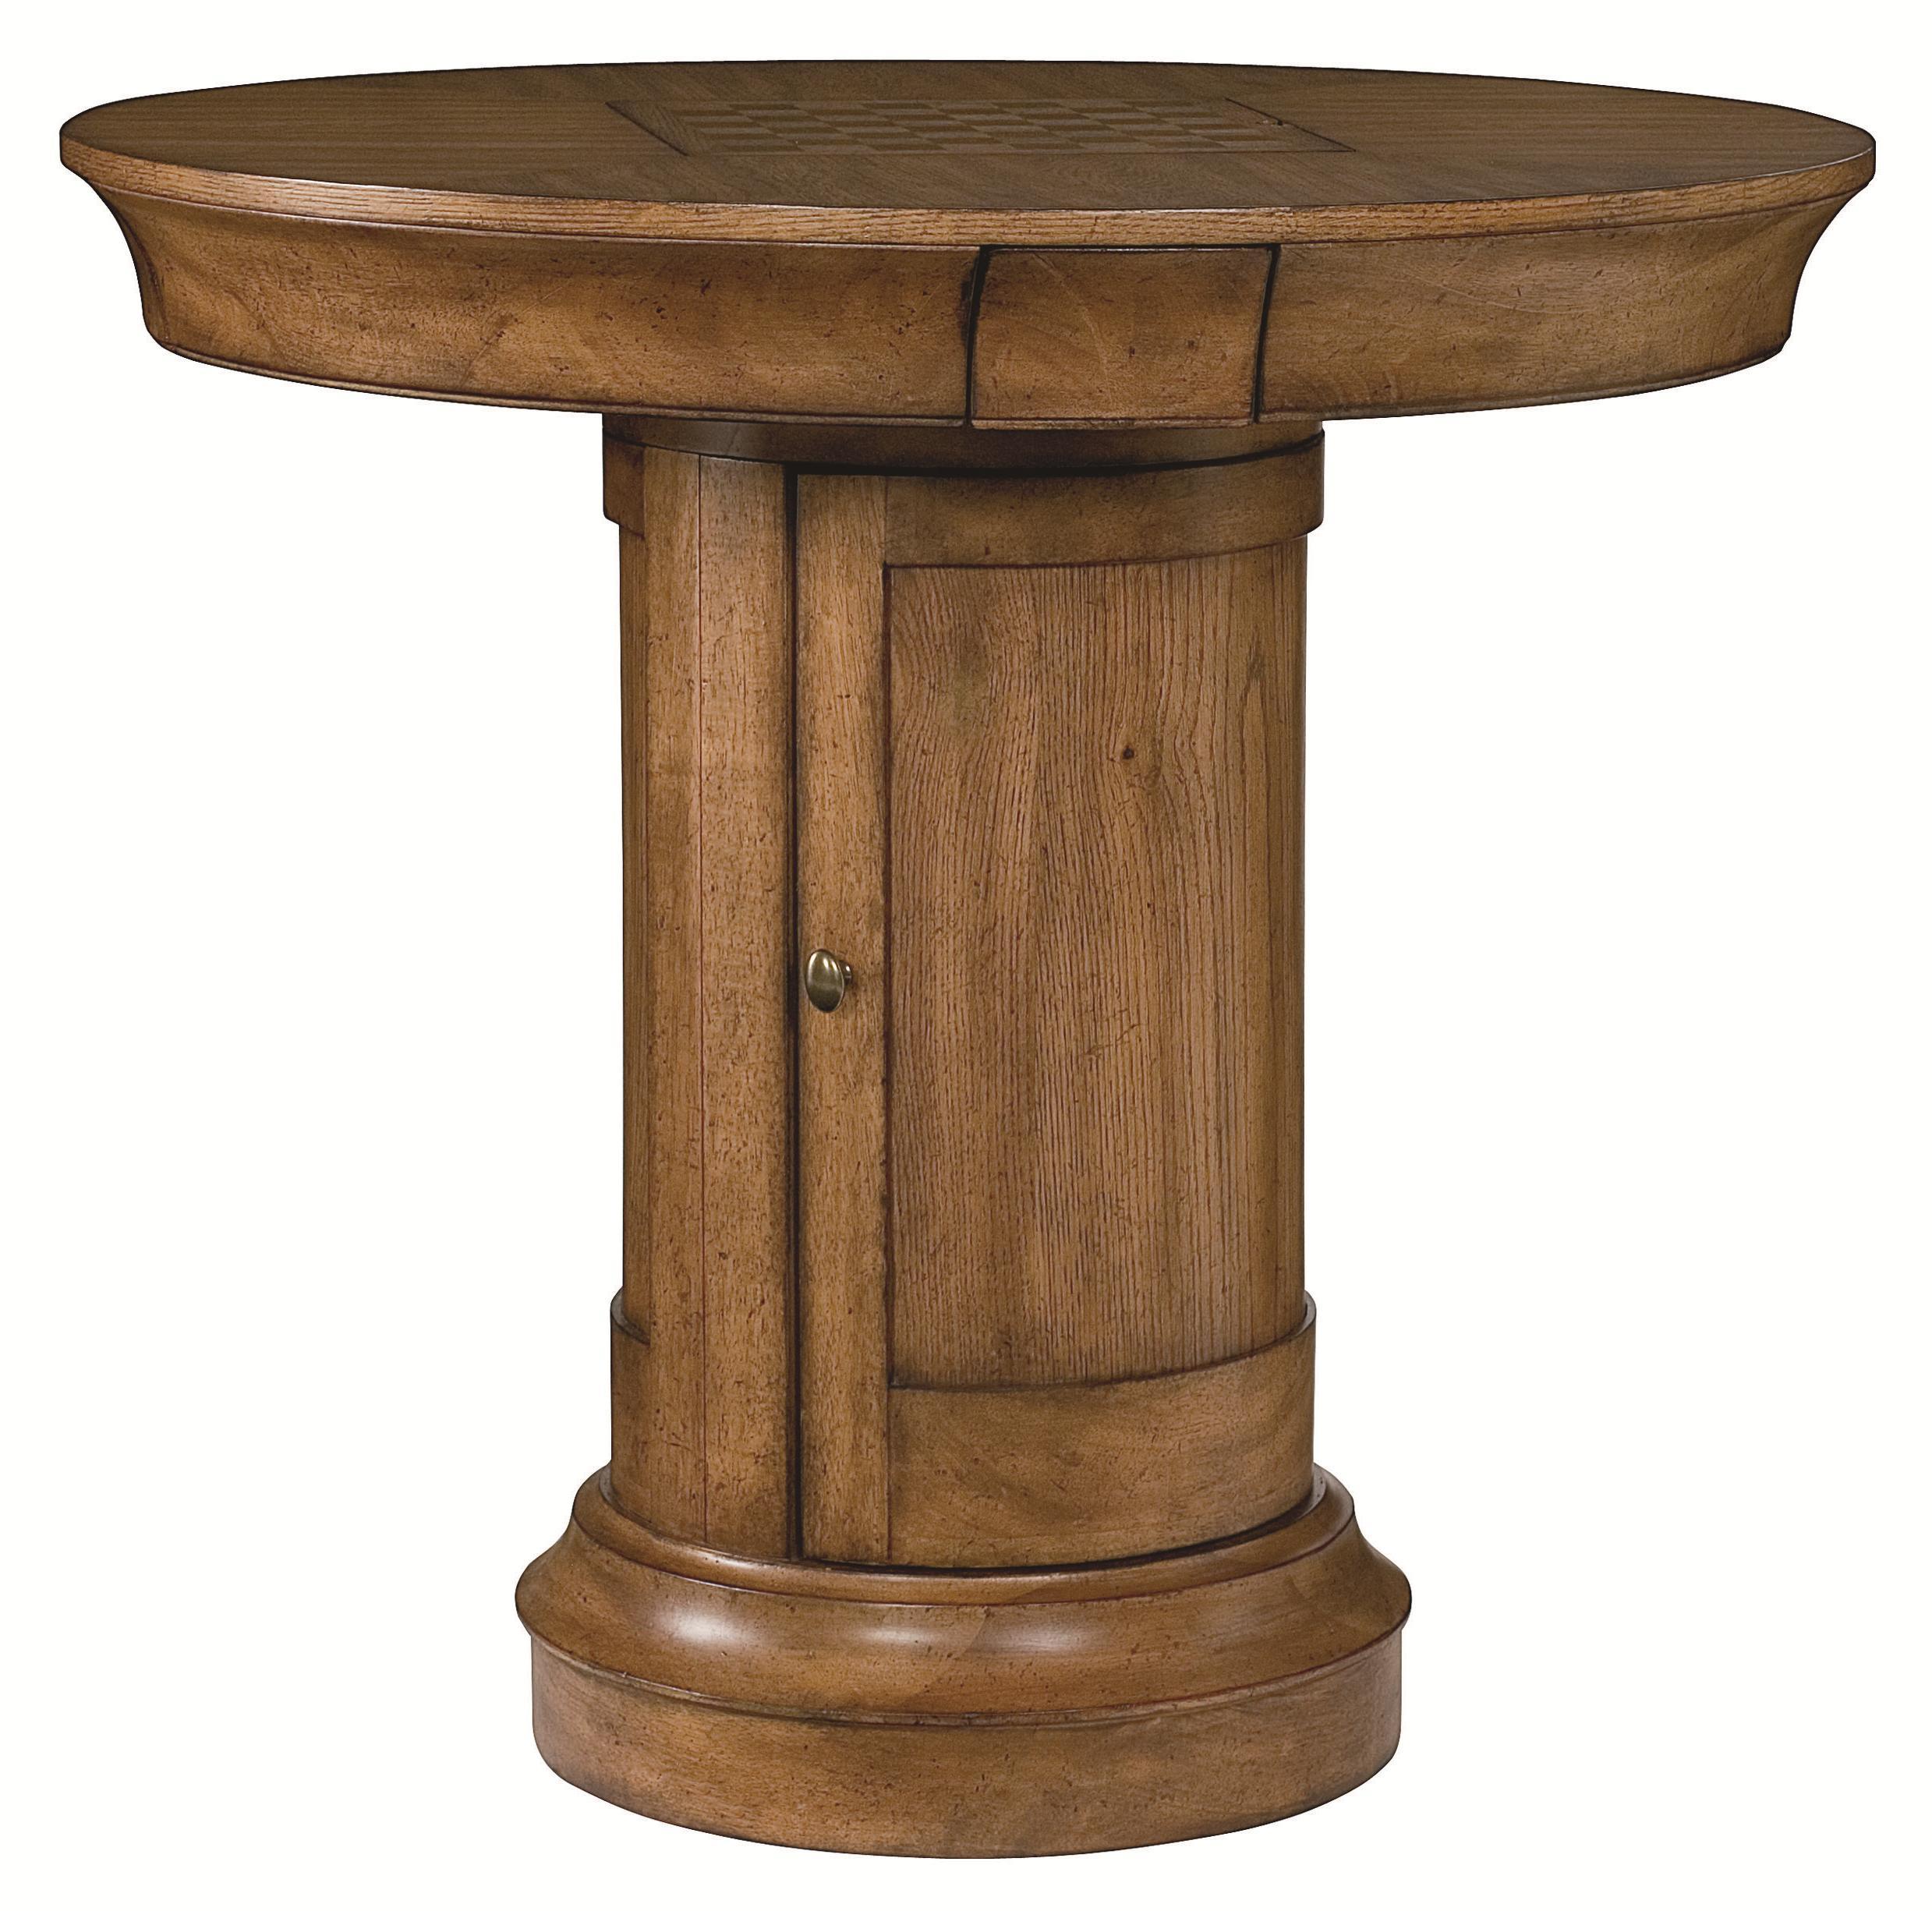 Hammary Hidden Treasures Oak Pub Table - Item Number: 090-454R